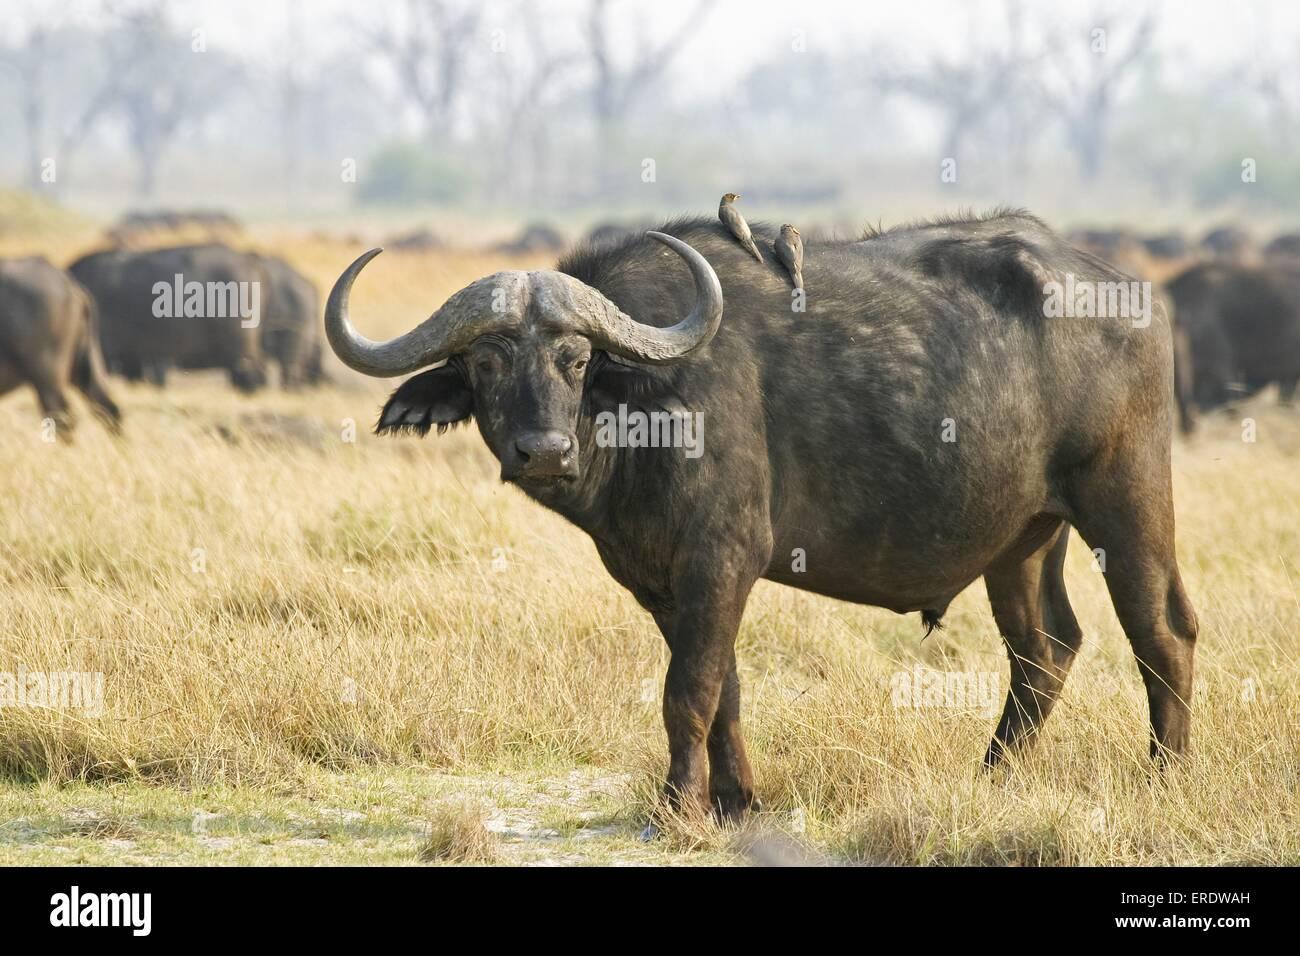 Cape Buffalos - Stock Image